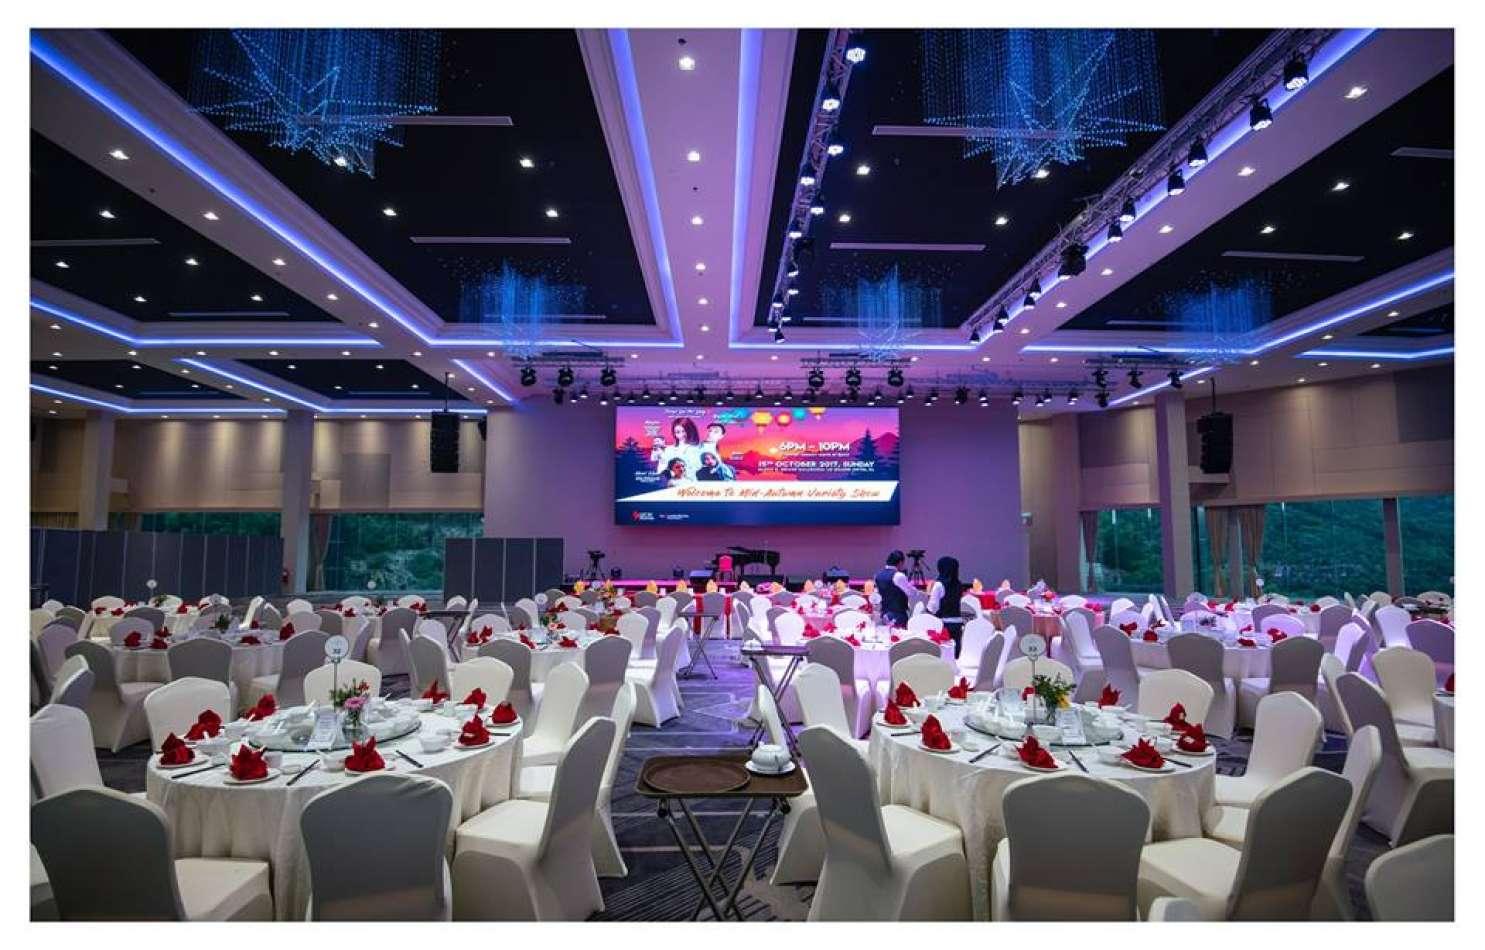 Le-Quadri-Hotel-KL-Grand-Ballroom15283600855b18ec954369f6.40398700.jpg